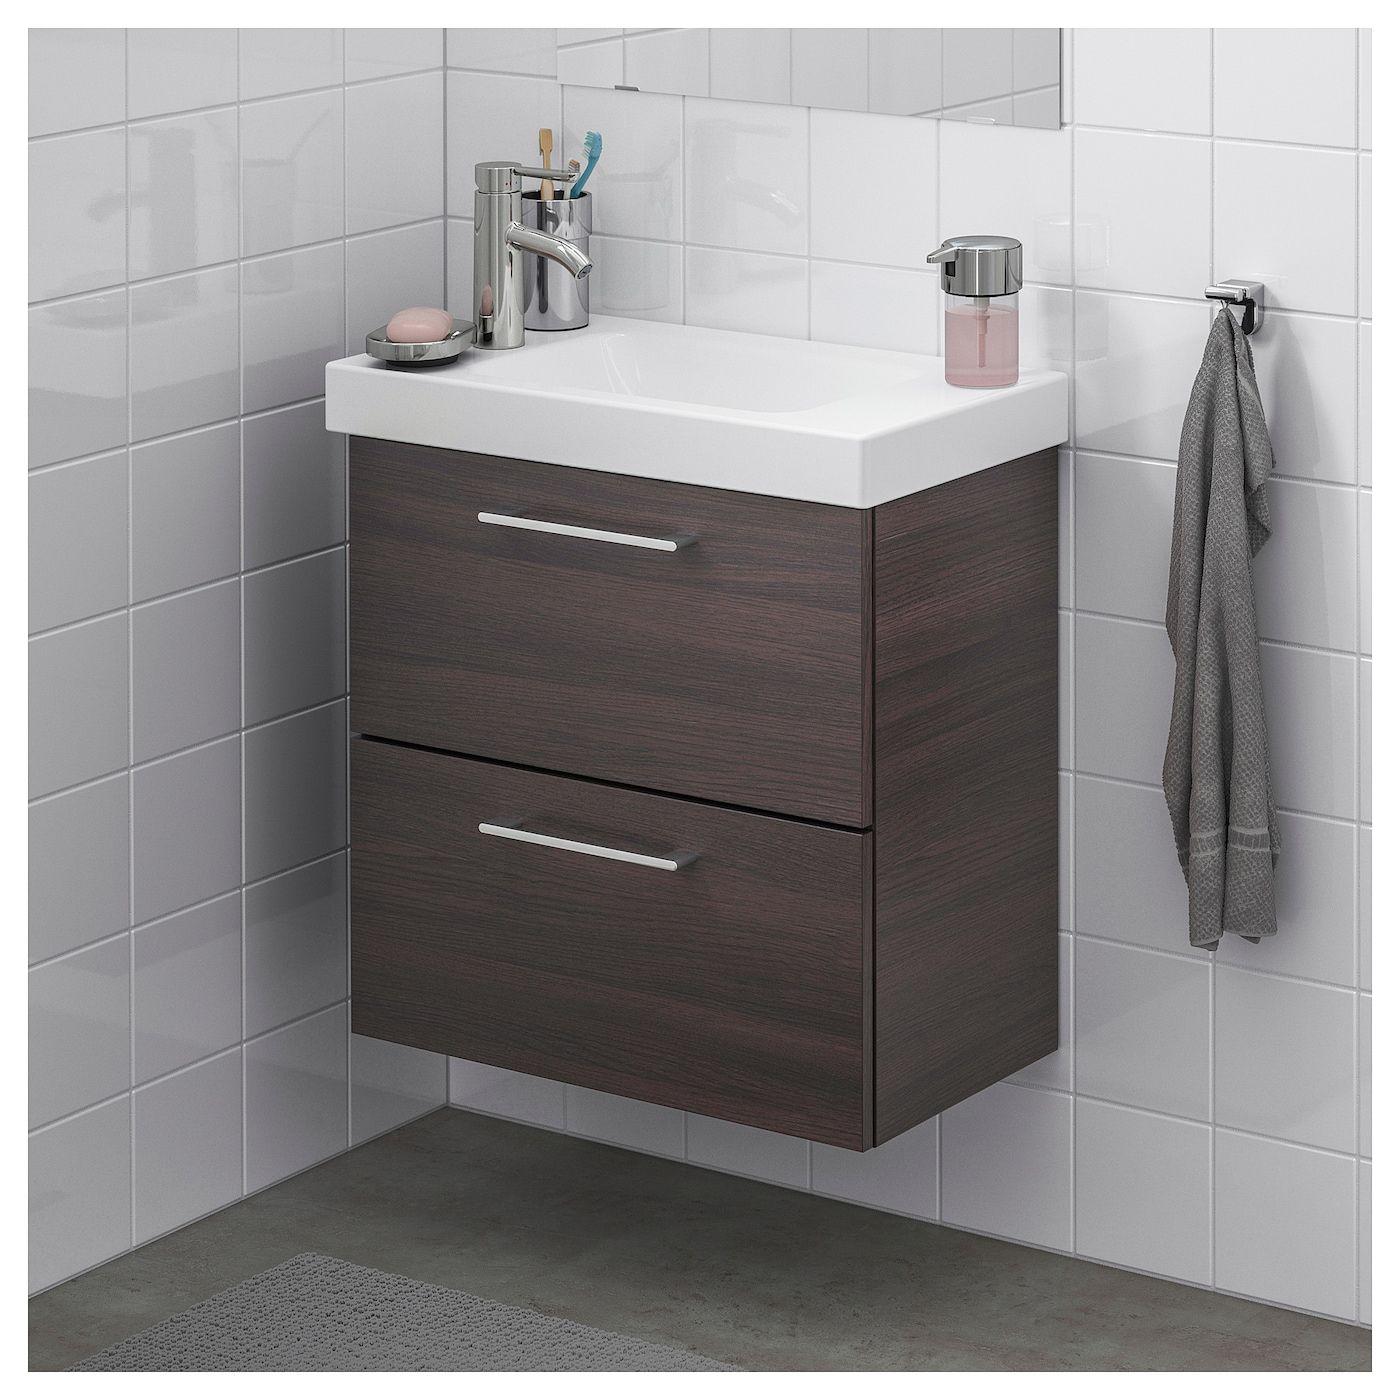 Ikea Godmorgon Hagaviken Bathroom Vanity Black Brown Dalskar Bathroom Vanity Sink Cabinet Ikea Godmorgon